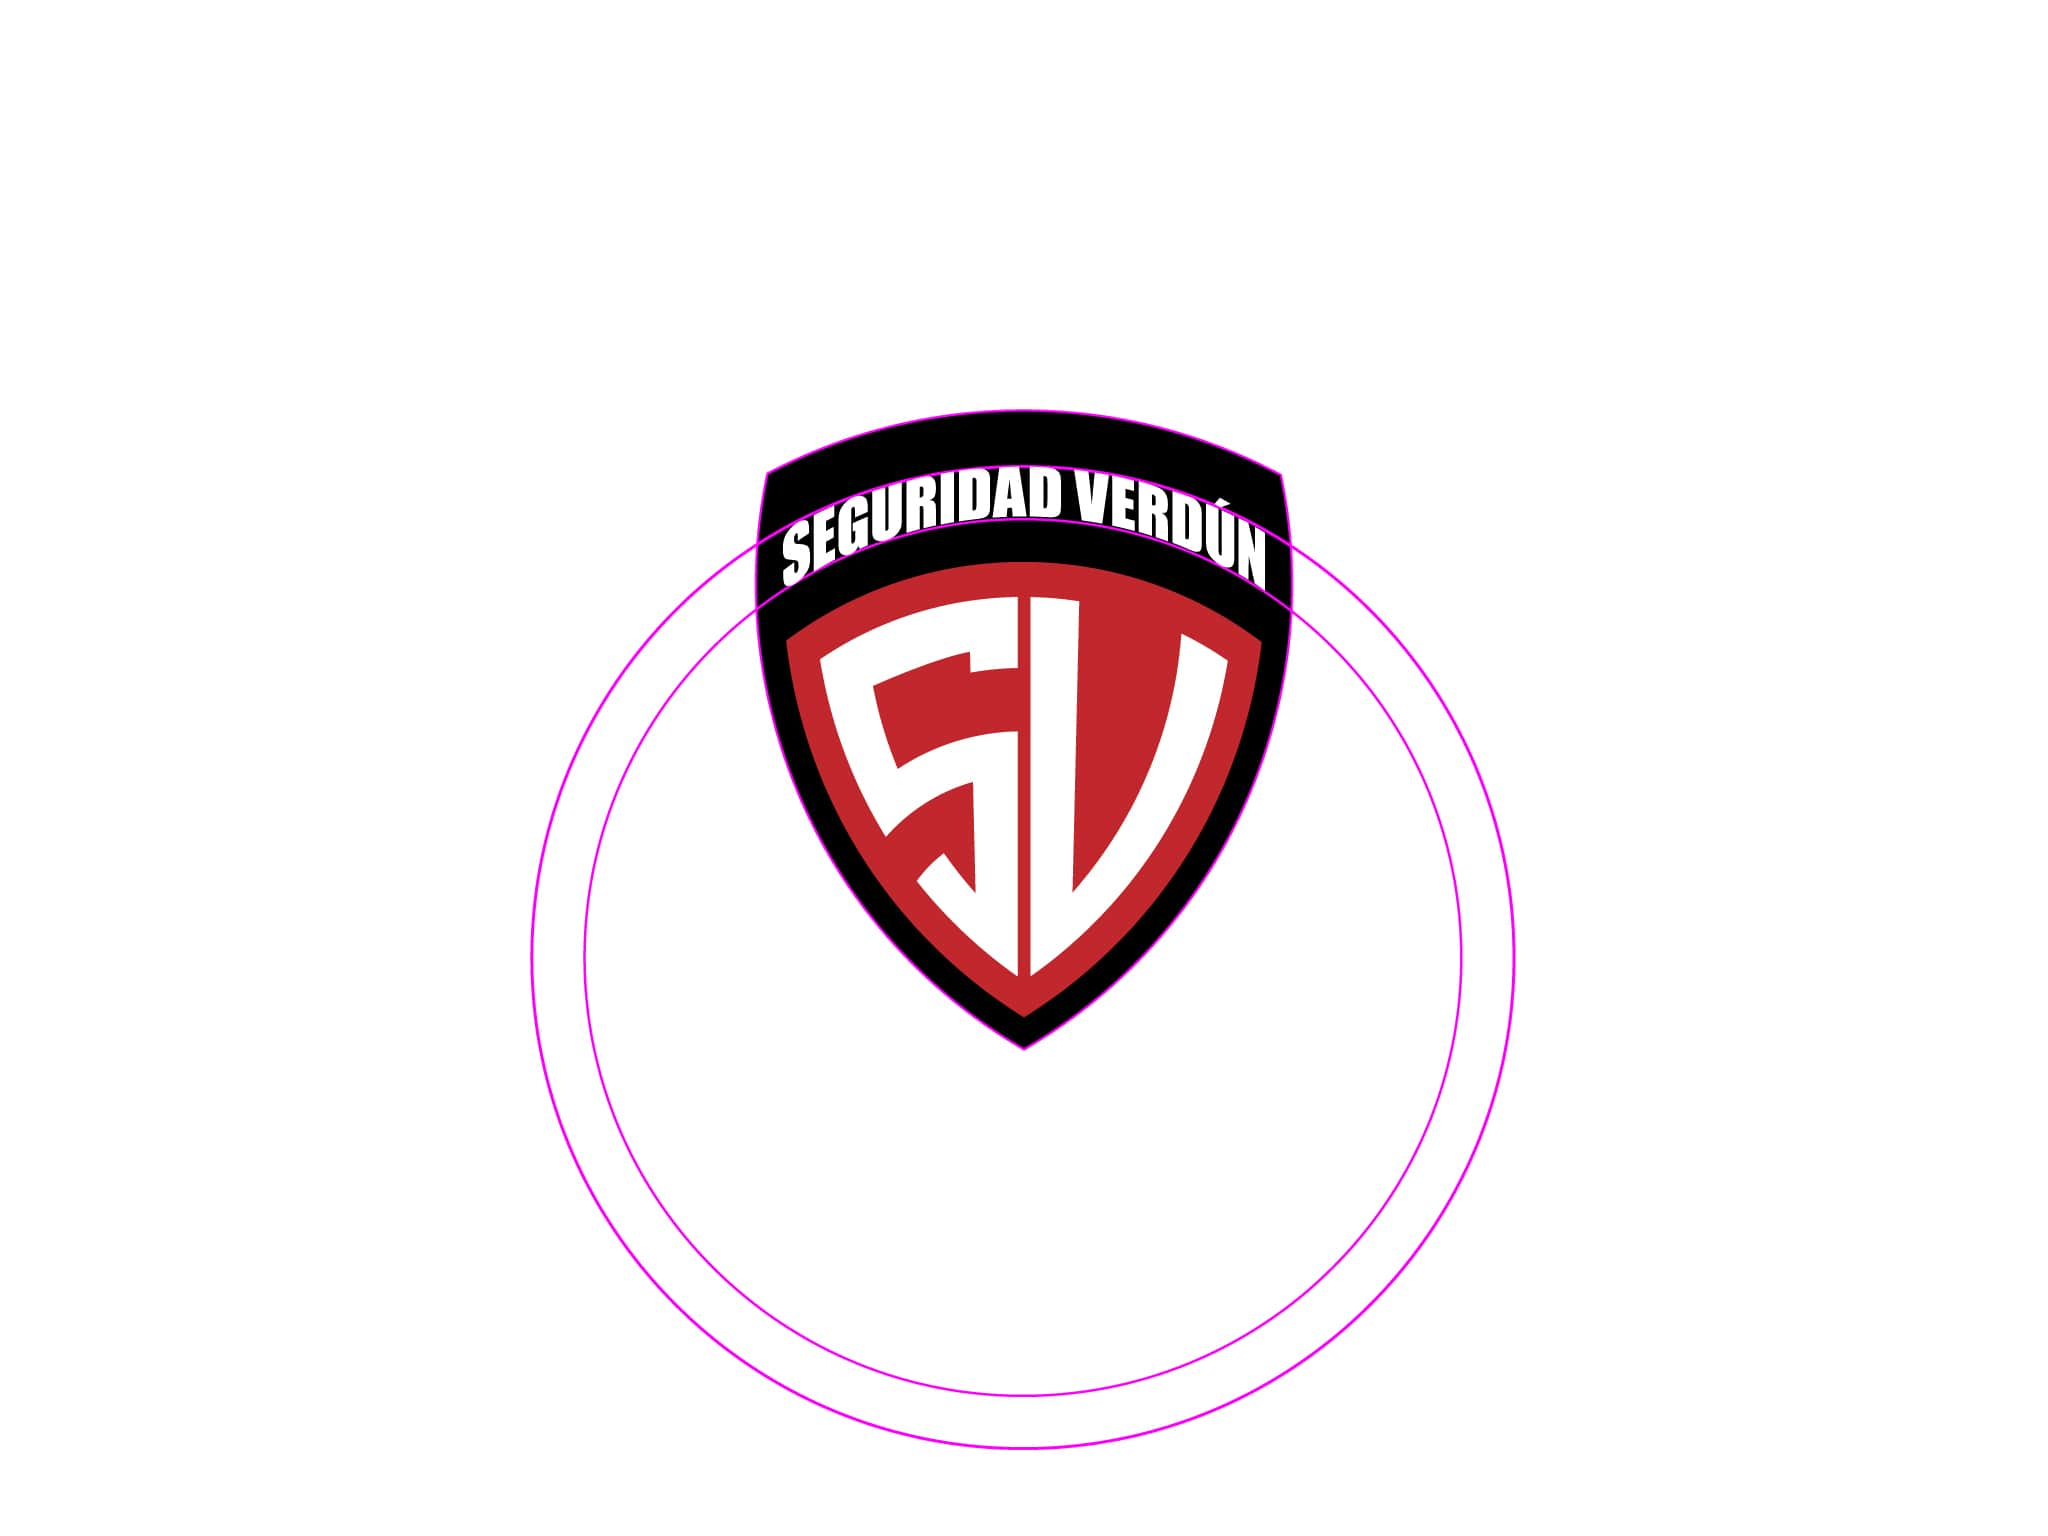 seguridad verdun branding